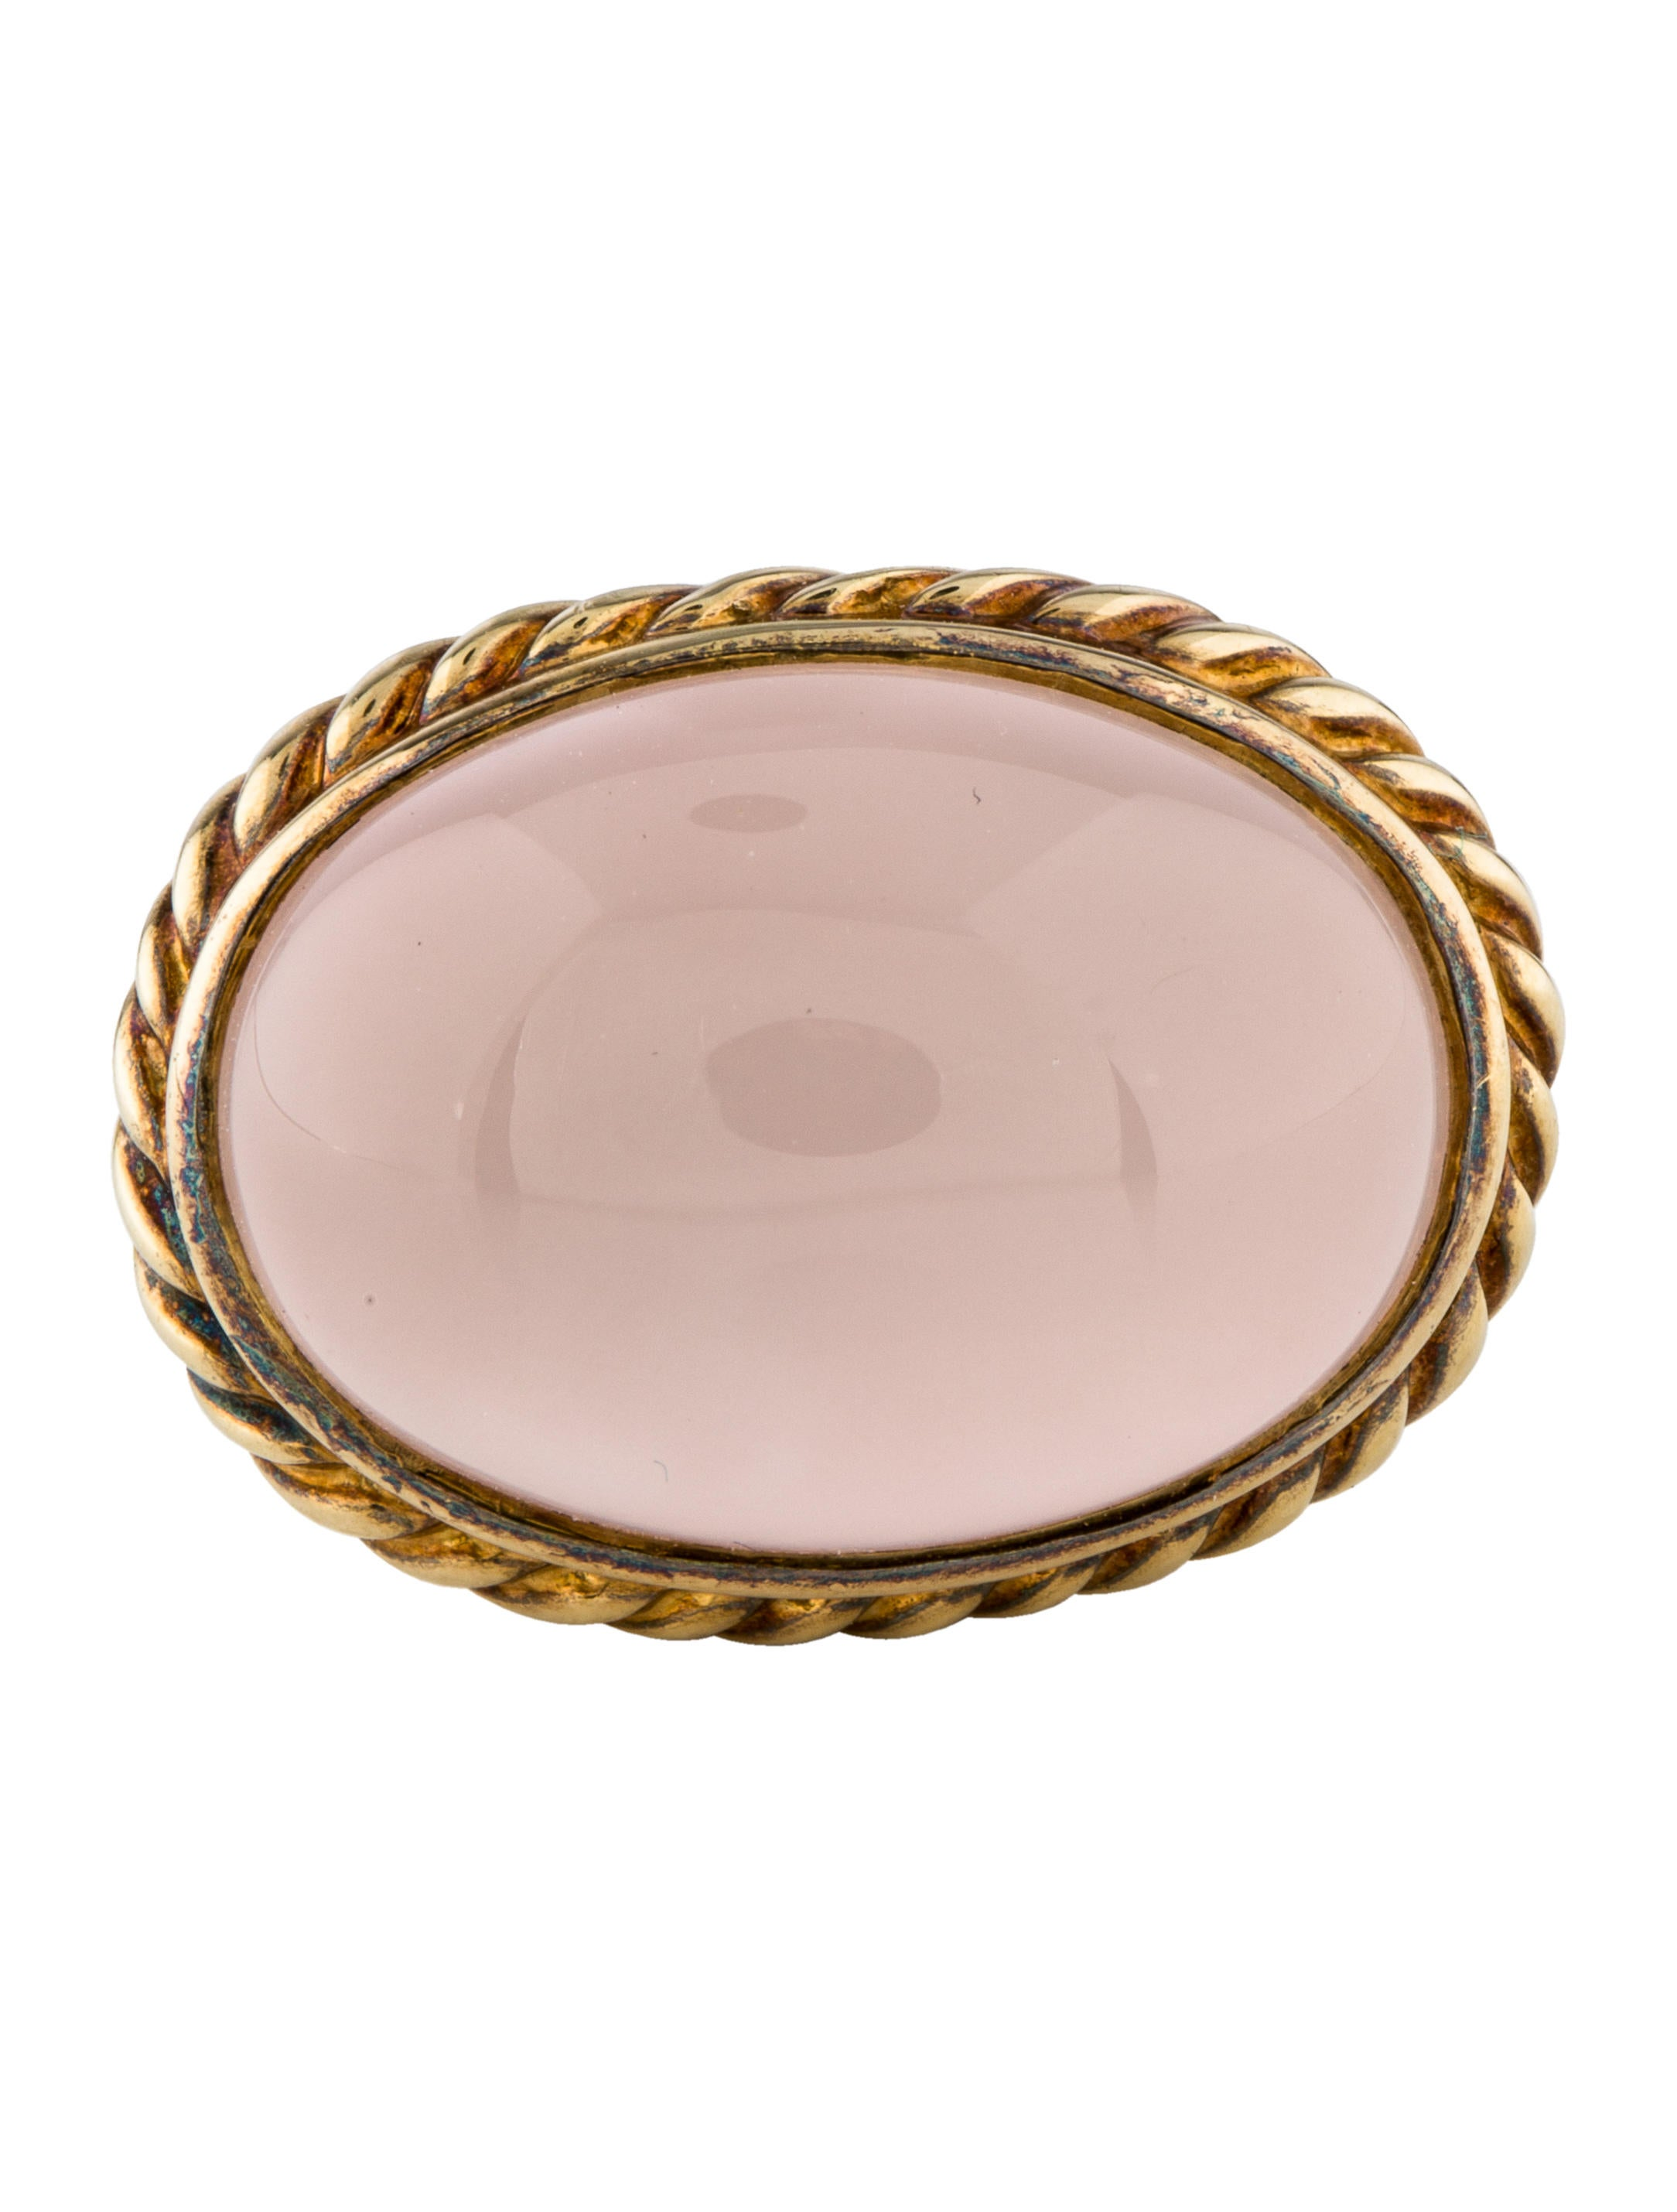 David Yurman Two-Tone Rose Quartz Ring - Rings - DVY50129 | The RealReal